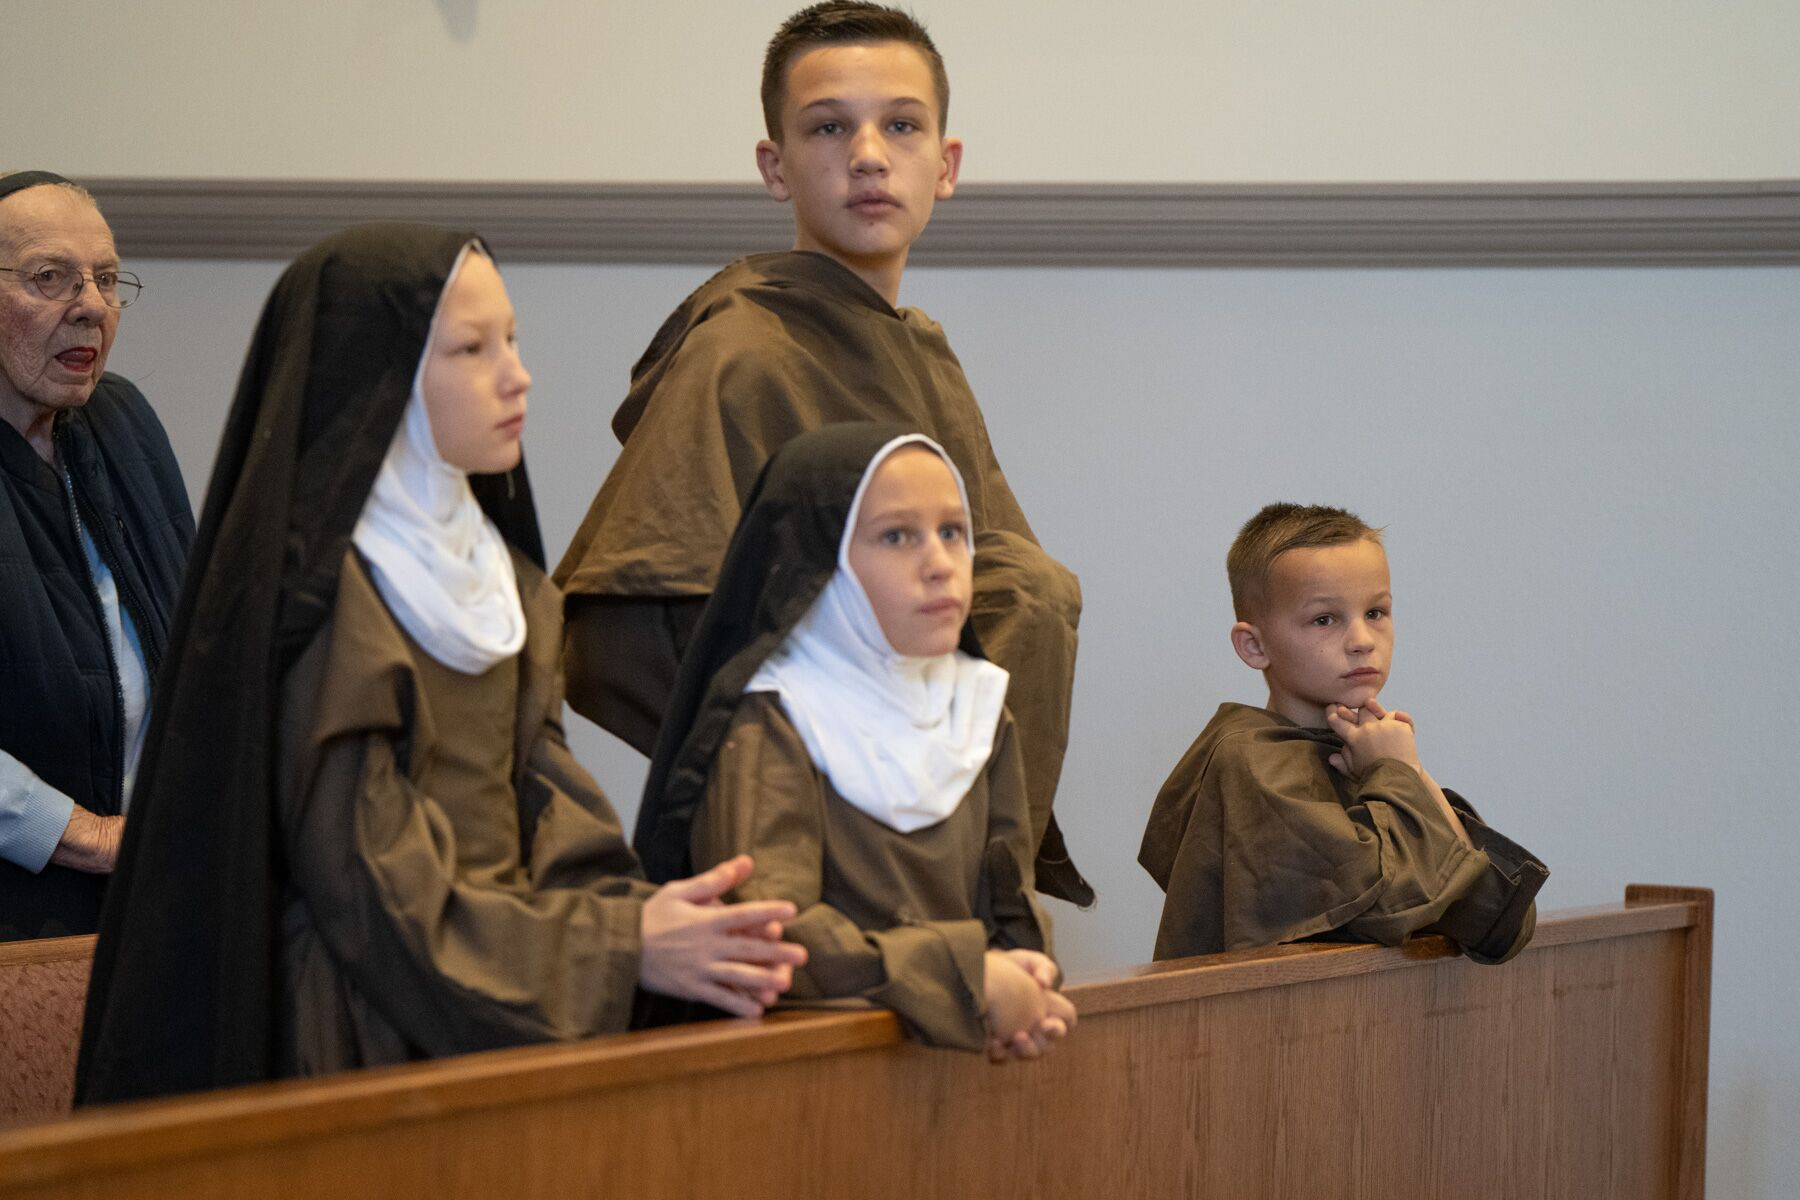 The Zucks as Franciscans